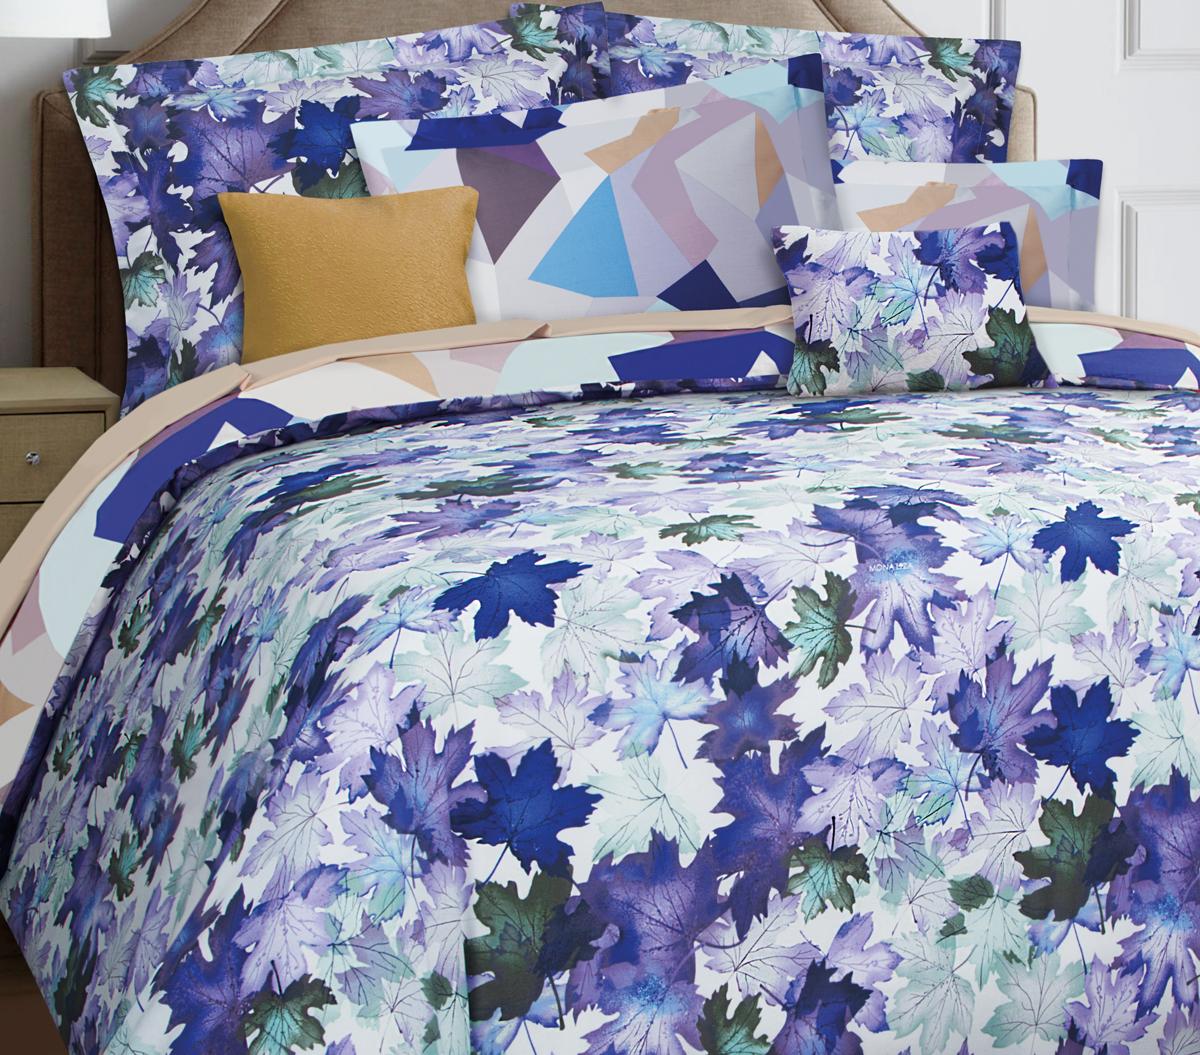 Комплект белья Mona Liza Premium Atelier Leaves, 2-спальный, наволочки 50х70, 70х70. 5044-0011